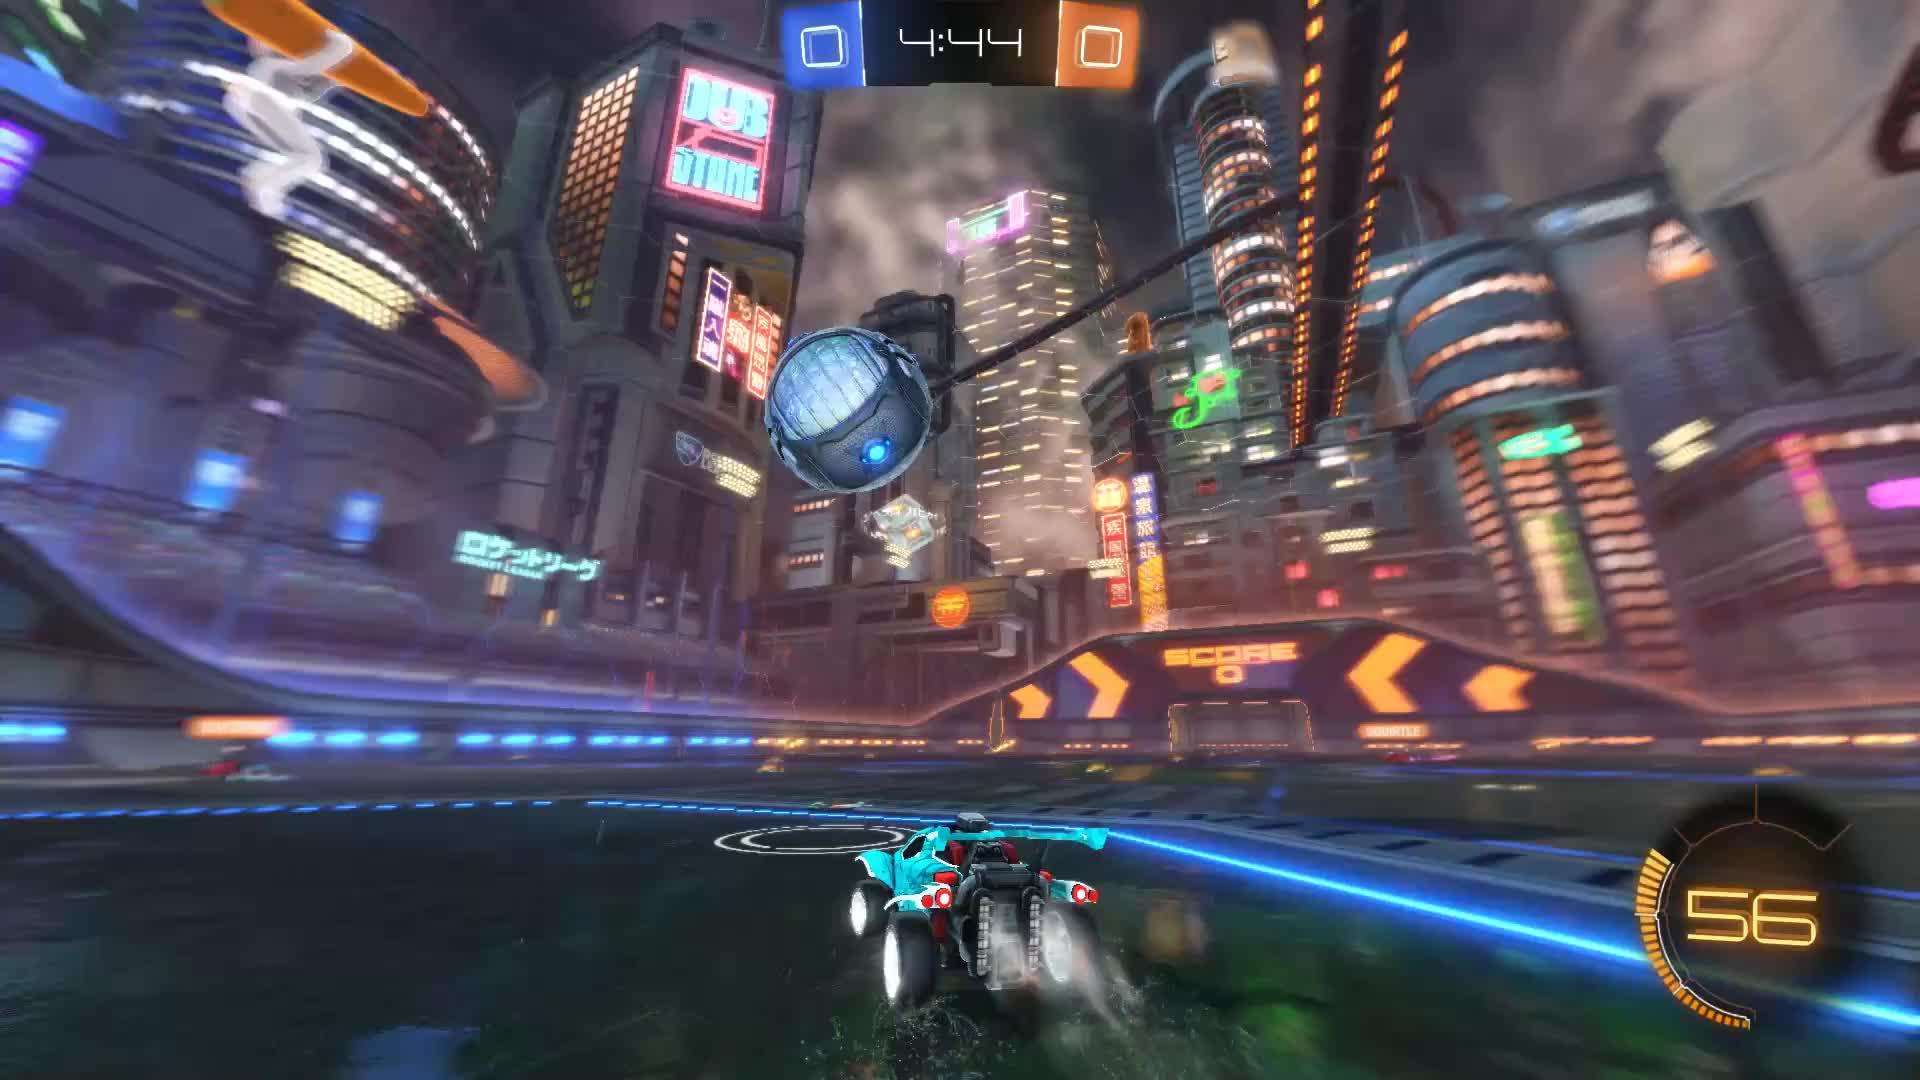 Gif Your Game, GifYourGame, Goal, Noflight, Rocket League, RocketLeague, Goal 1: Noflight GIFs